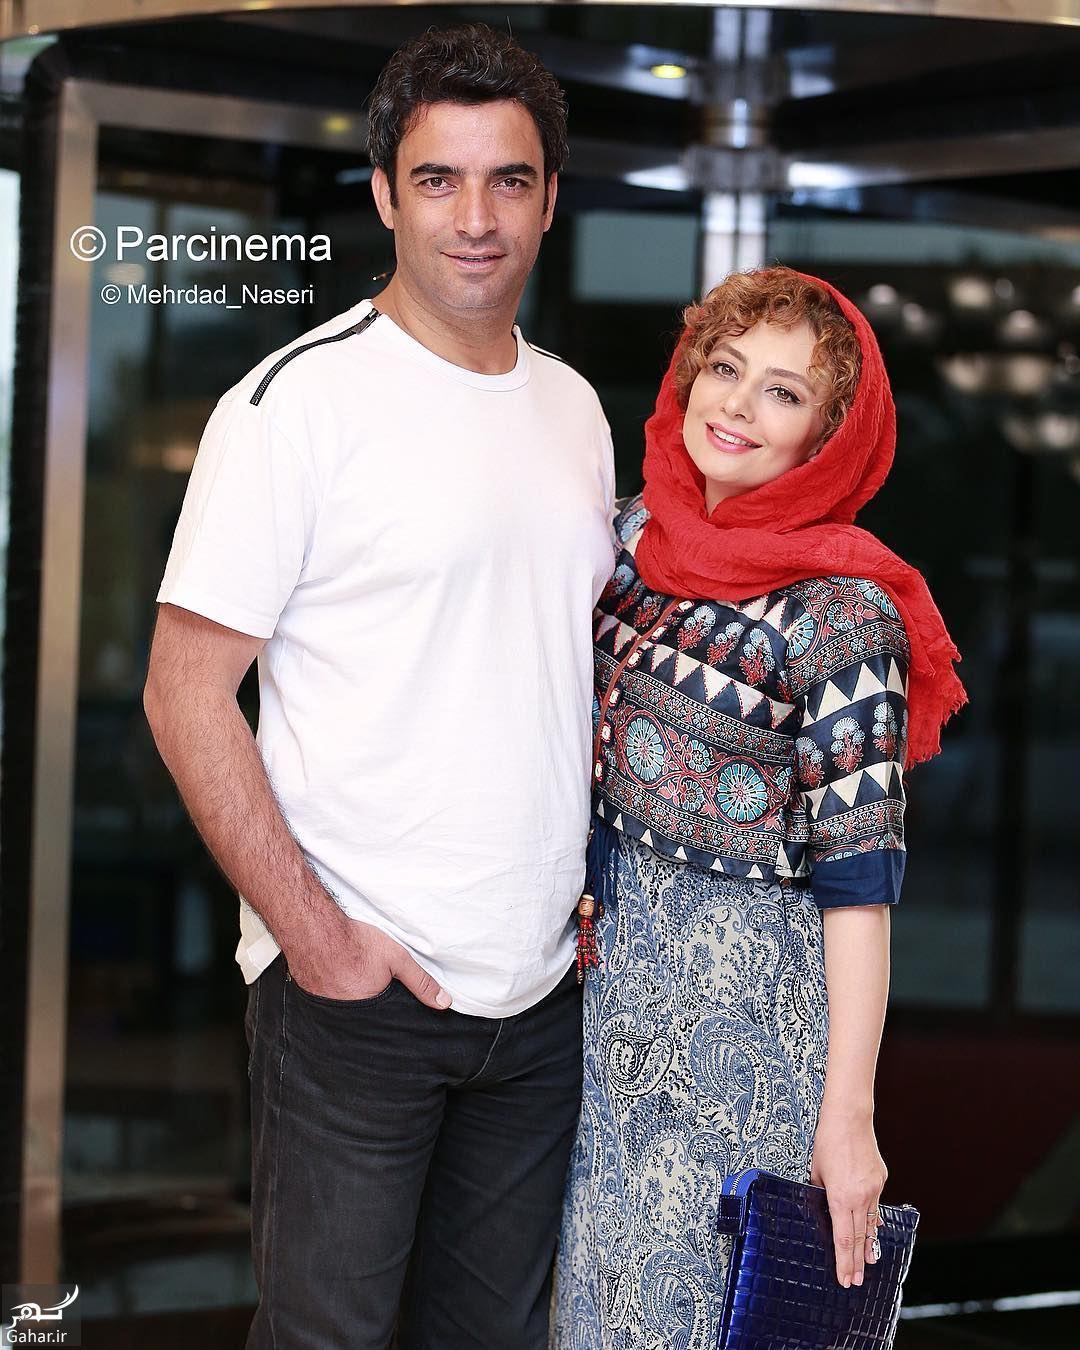 571697 Gahar ir عکس/ ژست های عاشقانه یکتا ناصر و همسرش در مراسم رونمایی از پوستر آینه بغل